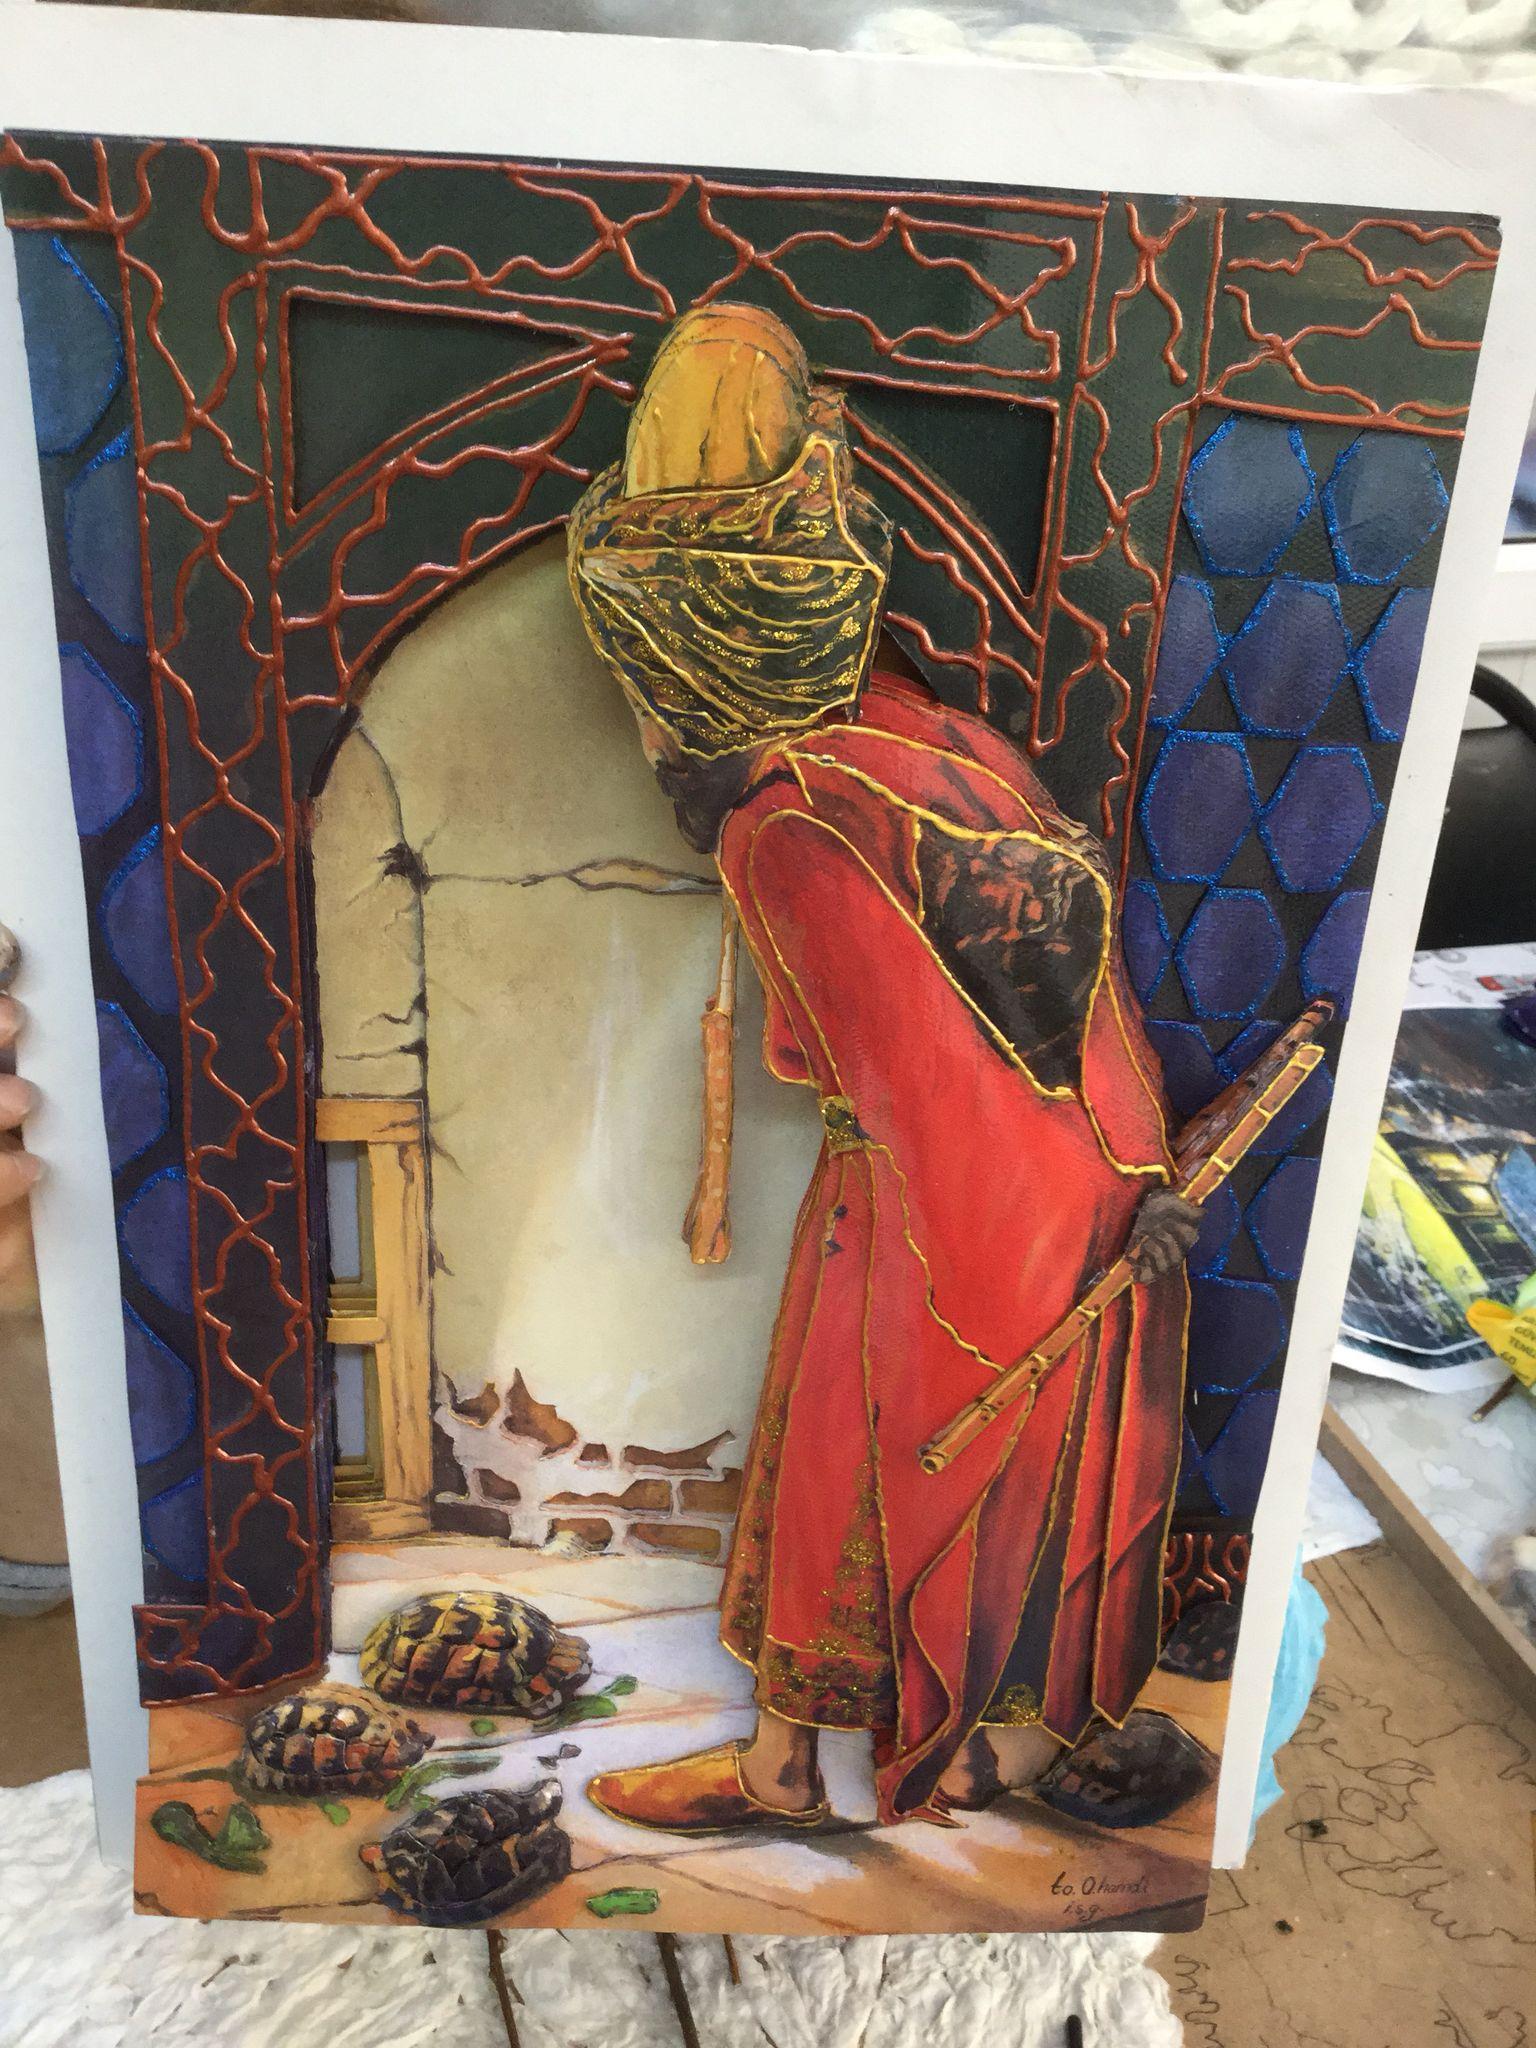 Osman Hamdi Kaplumbaga Terbiyecisi Kavramsal Sanat Tablolar Sanat